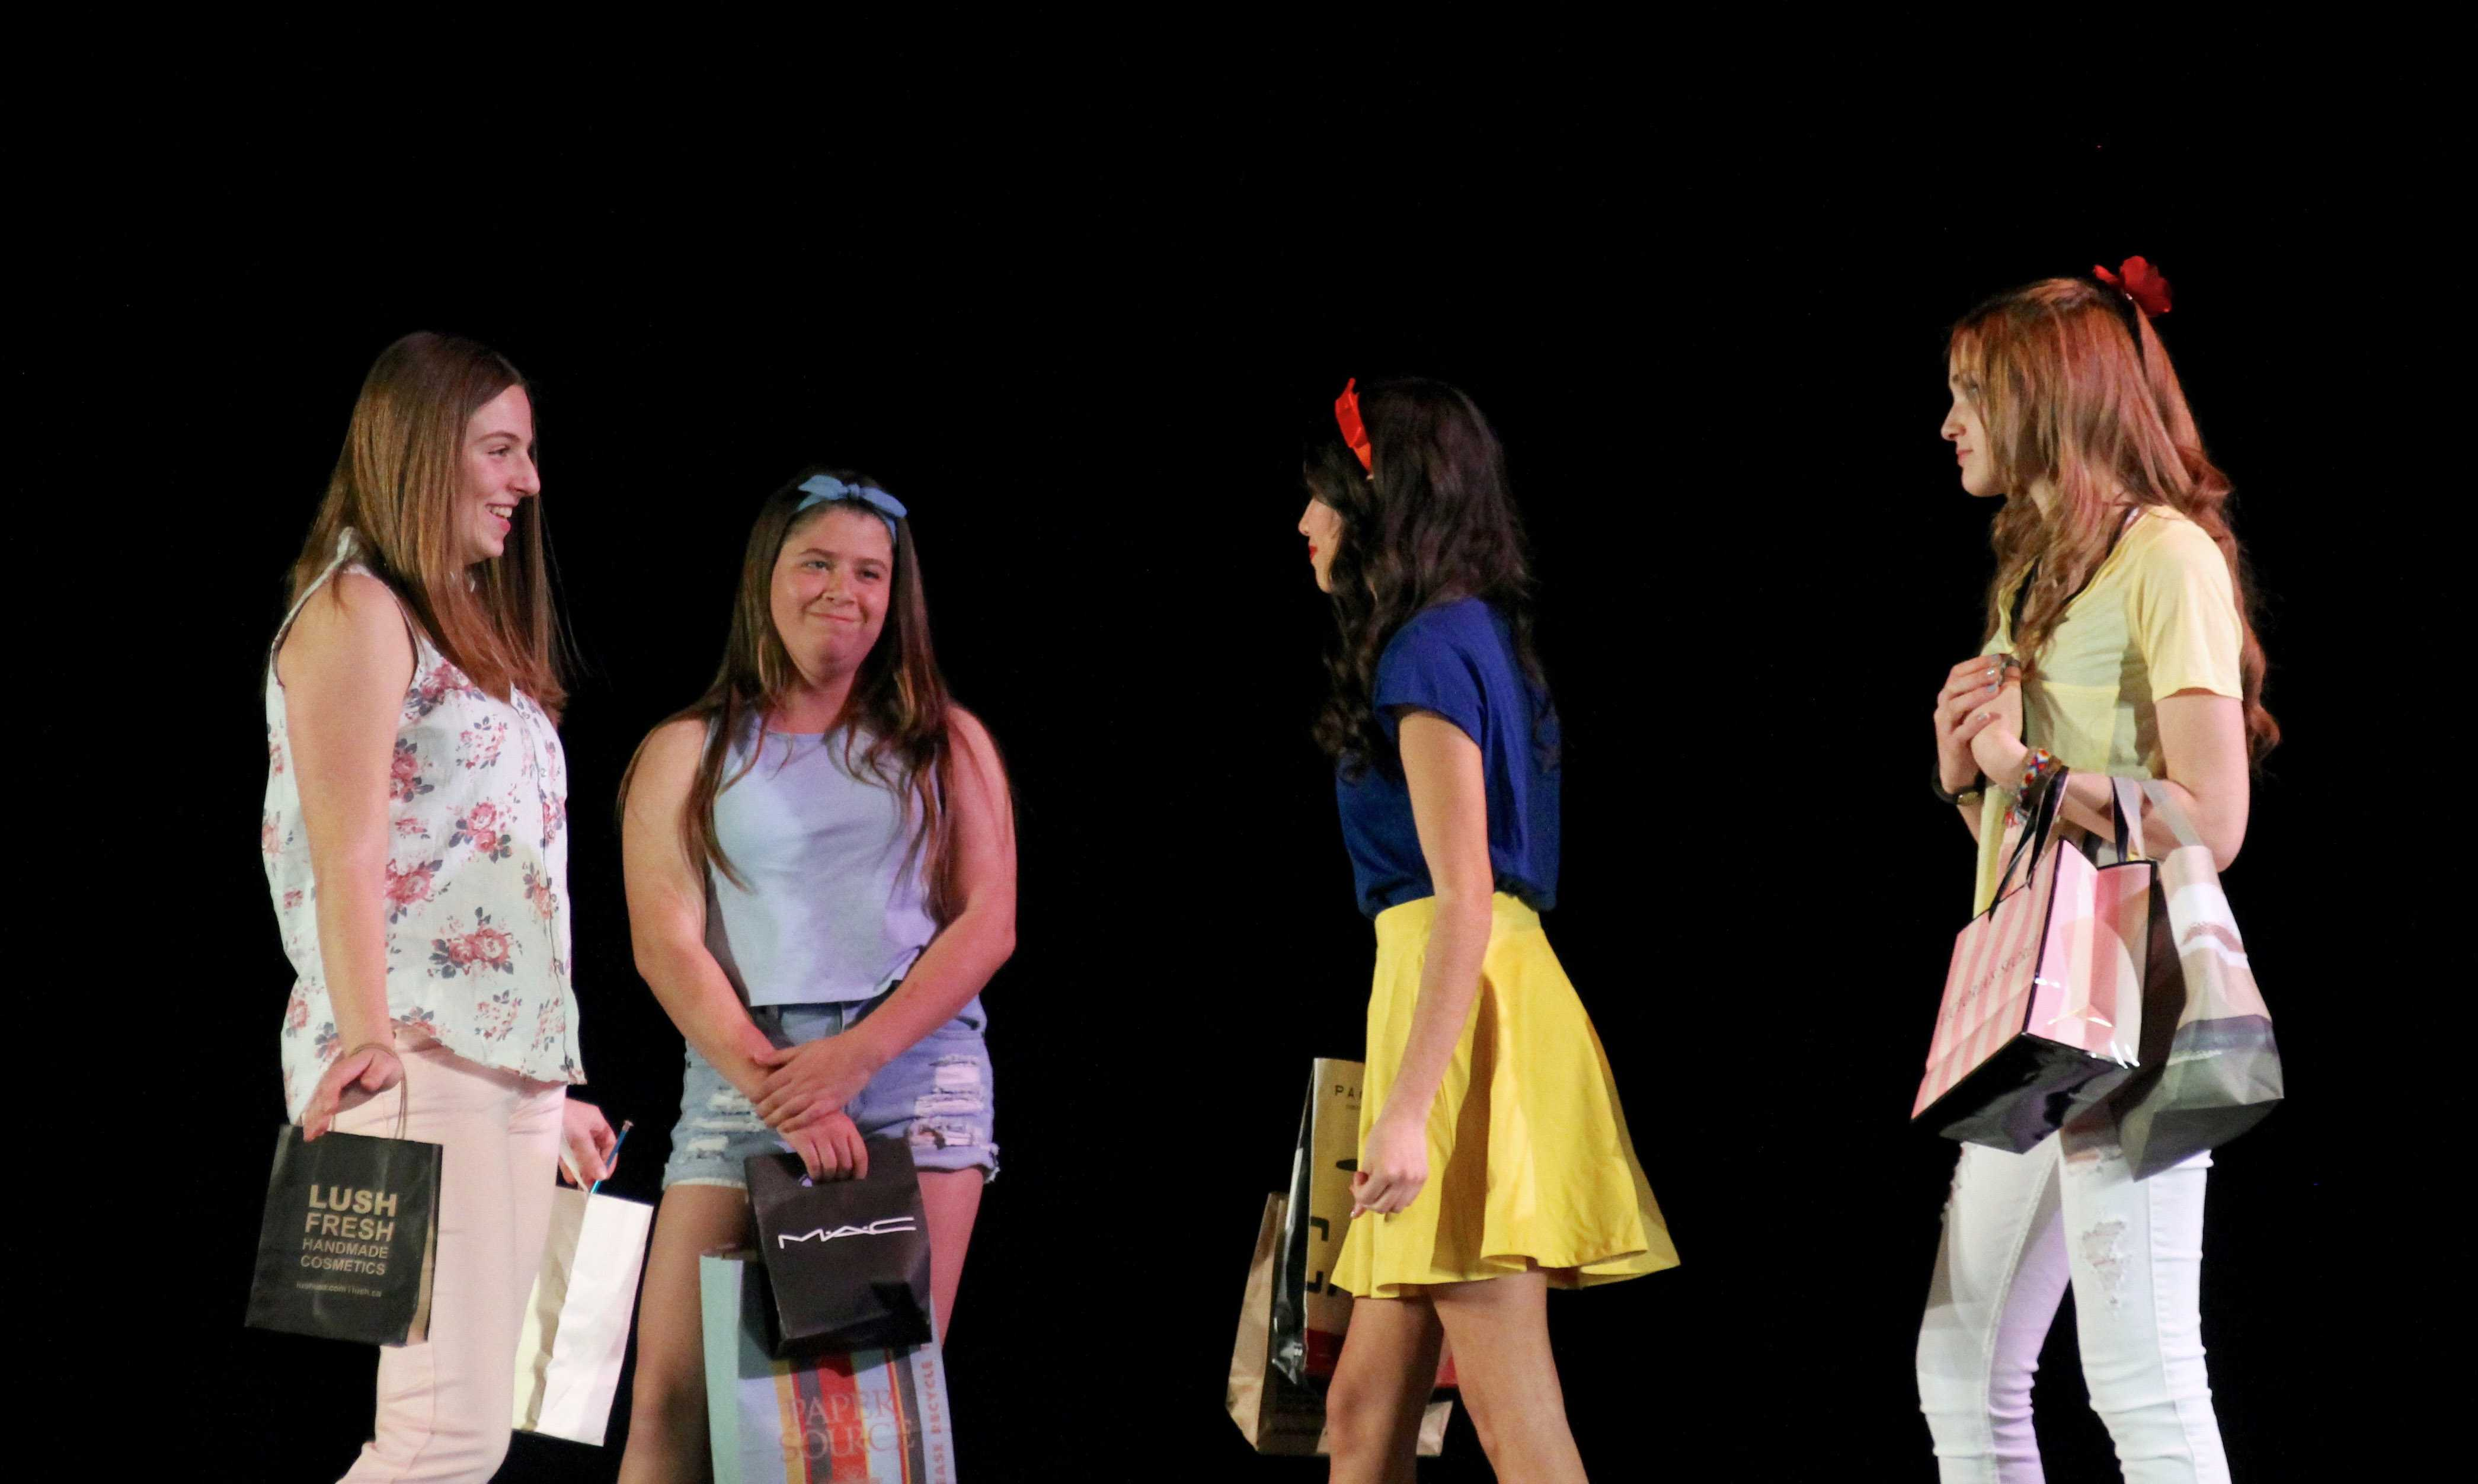 Sara Bressler, Sarah Winston, Grace Liriano, and Vanessa Sheinbaum